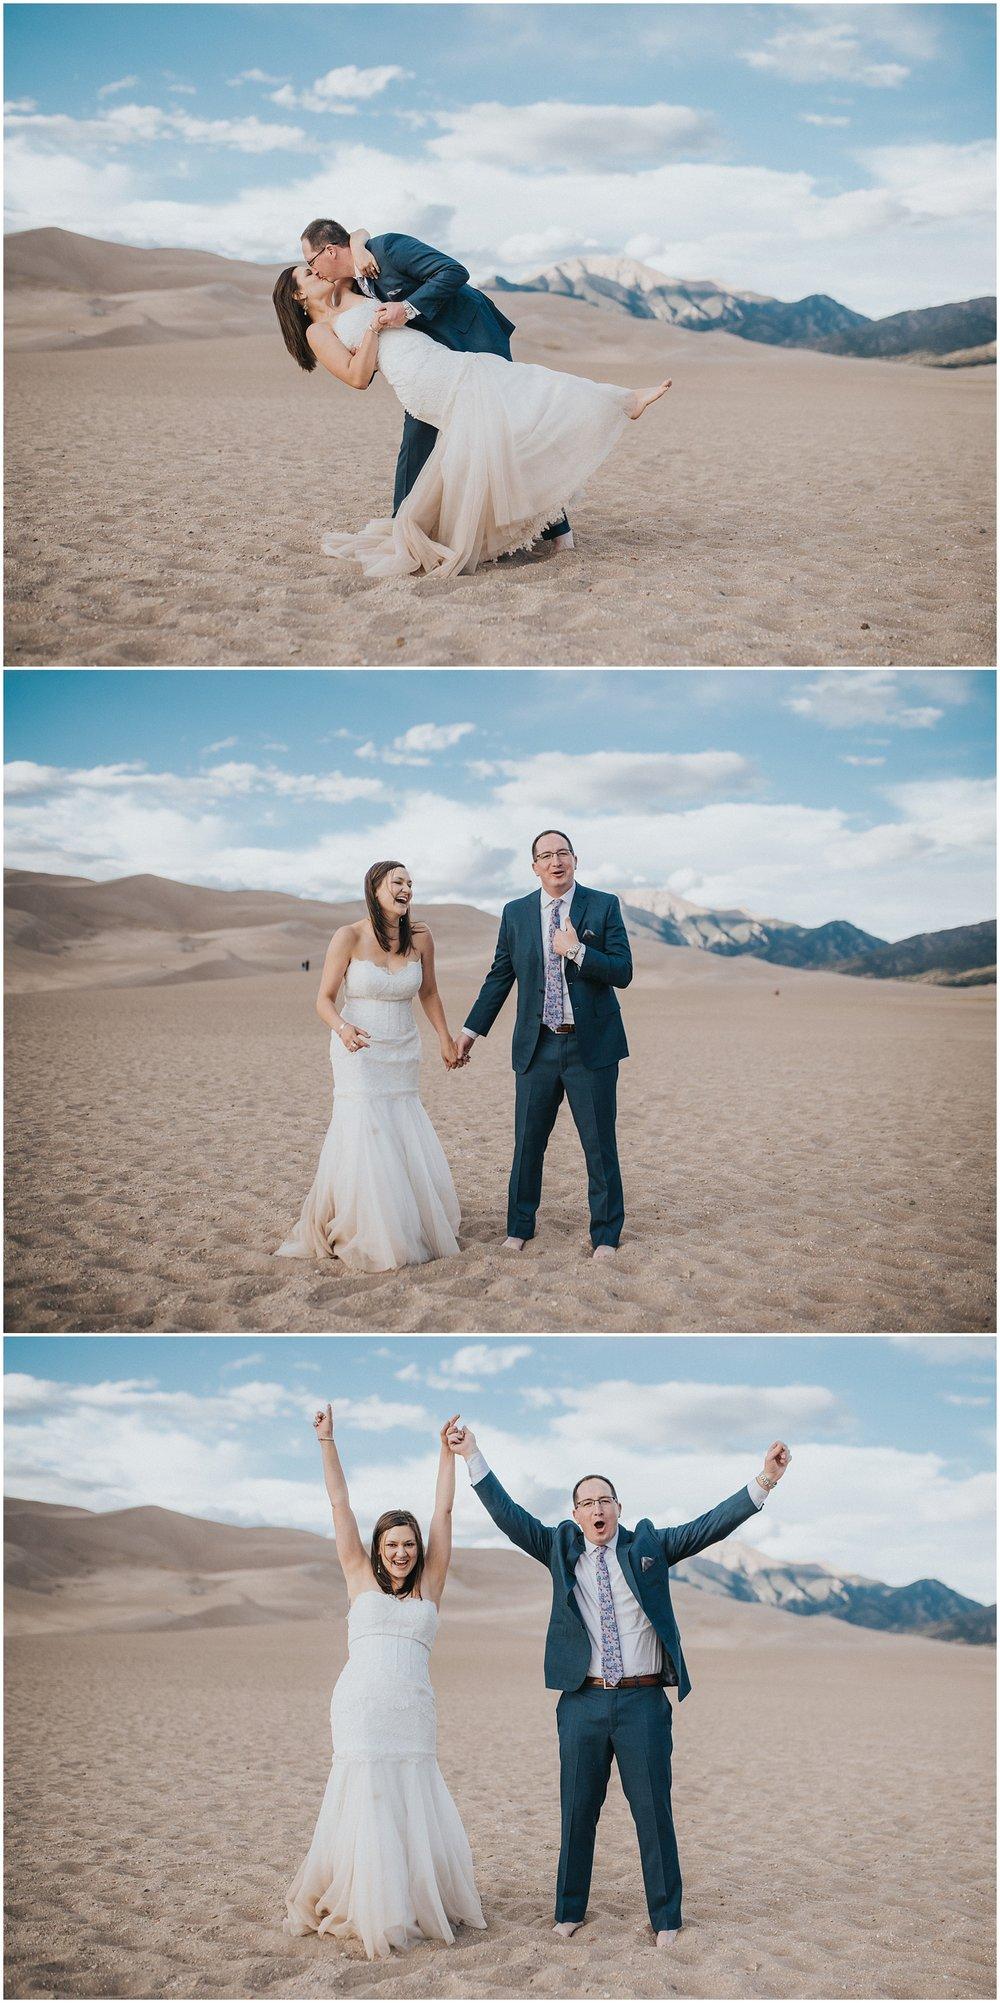 sand-dunes-national-park-wedding-photos_0018.jpg